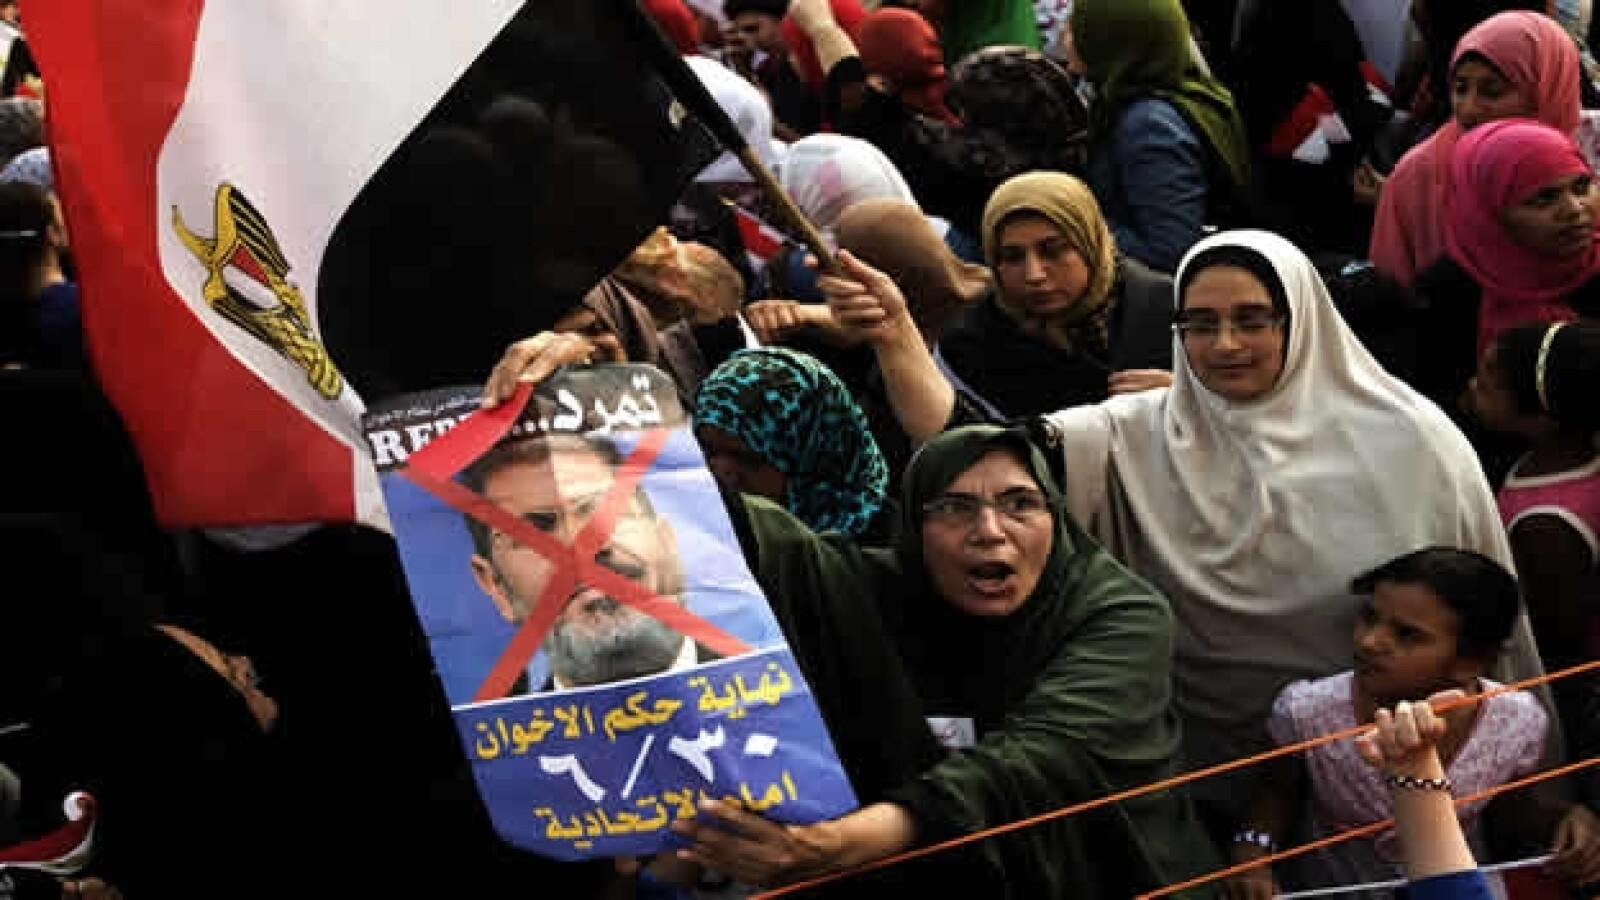 egipcios protestando